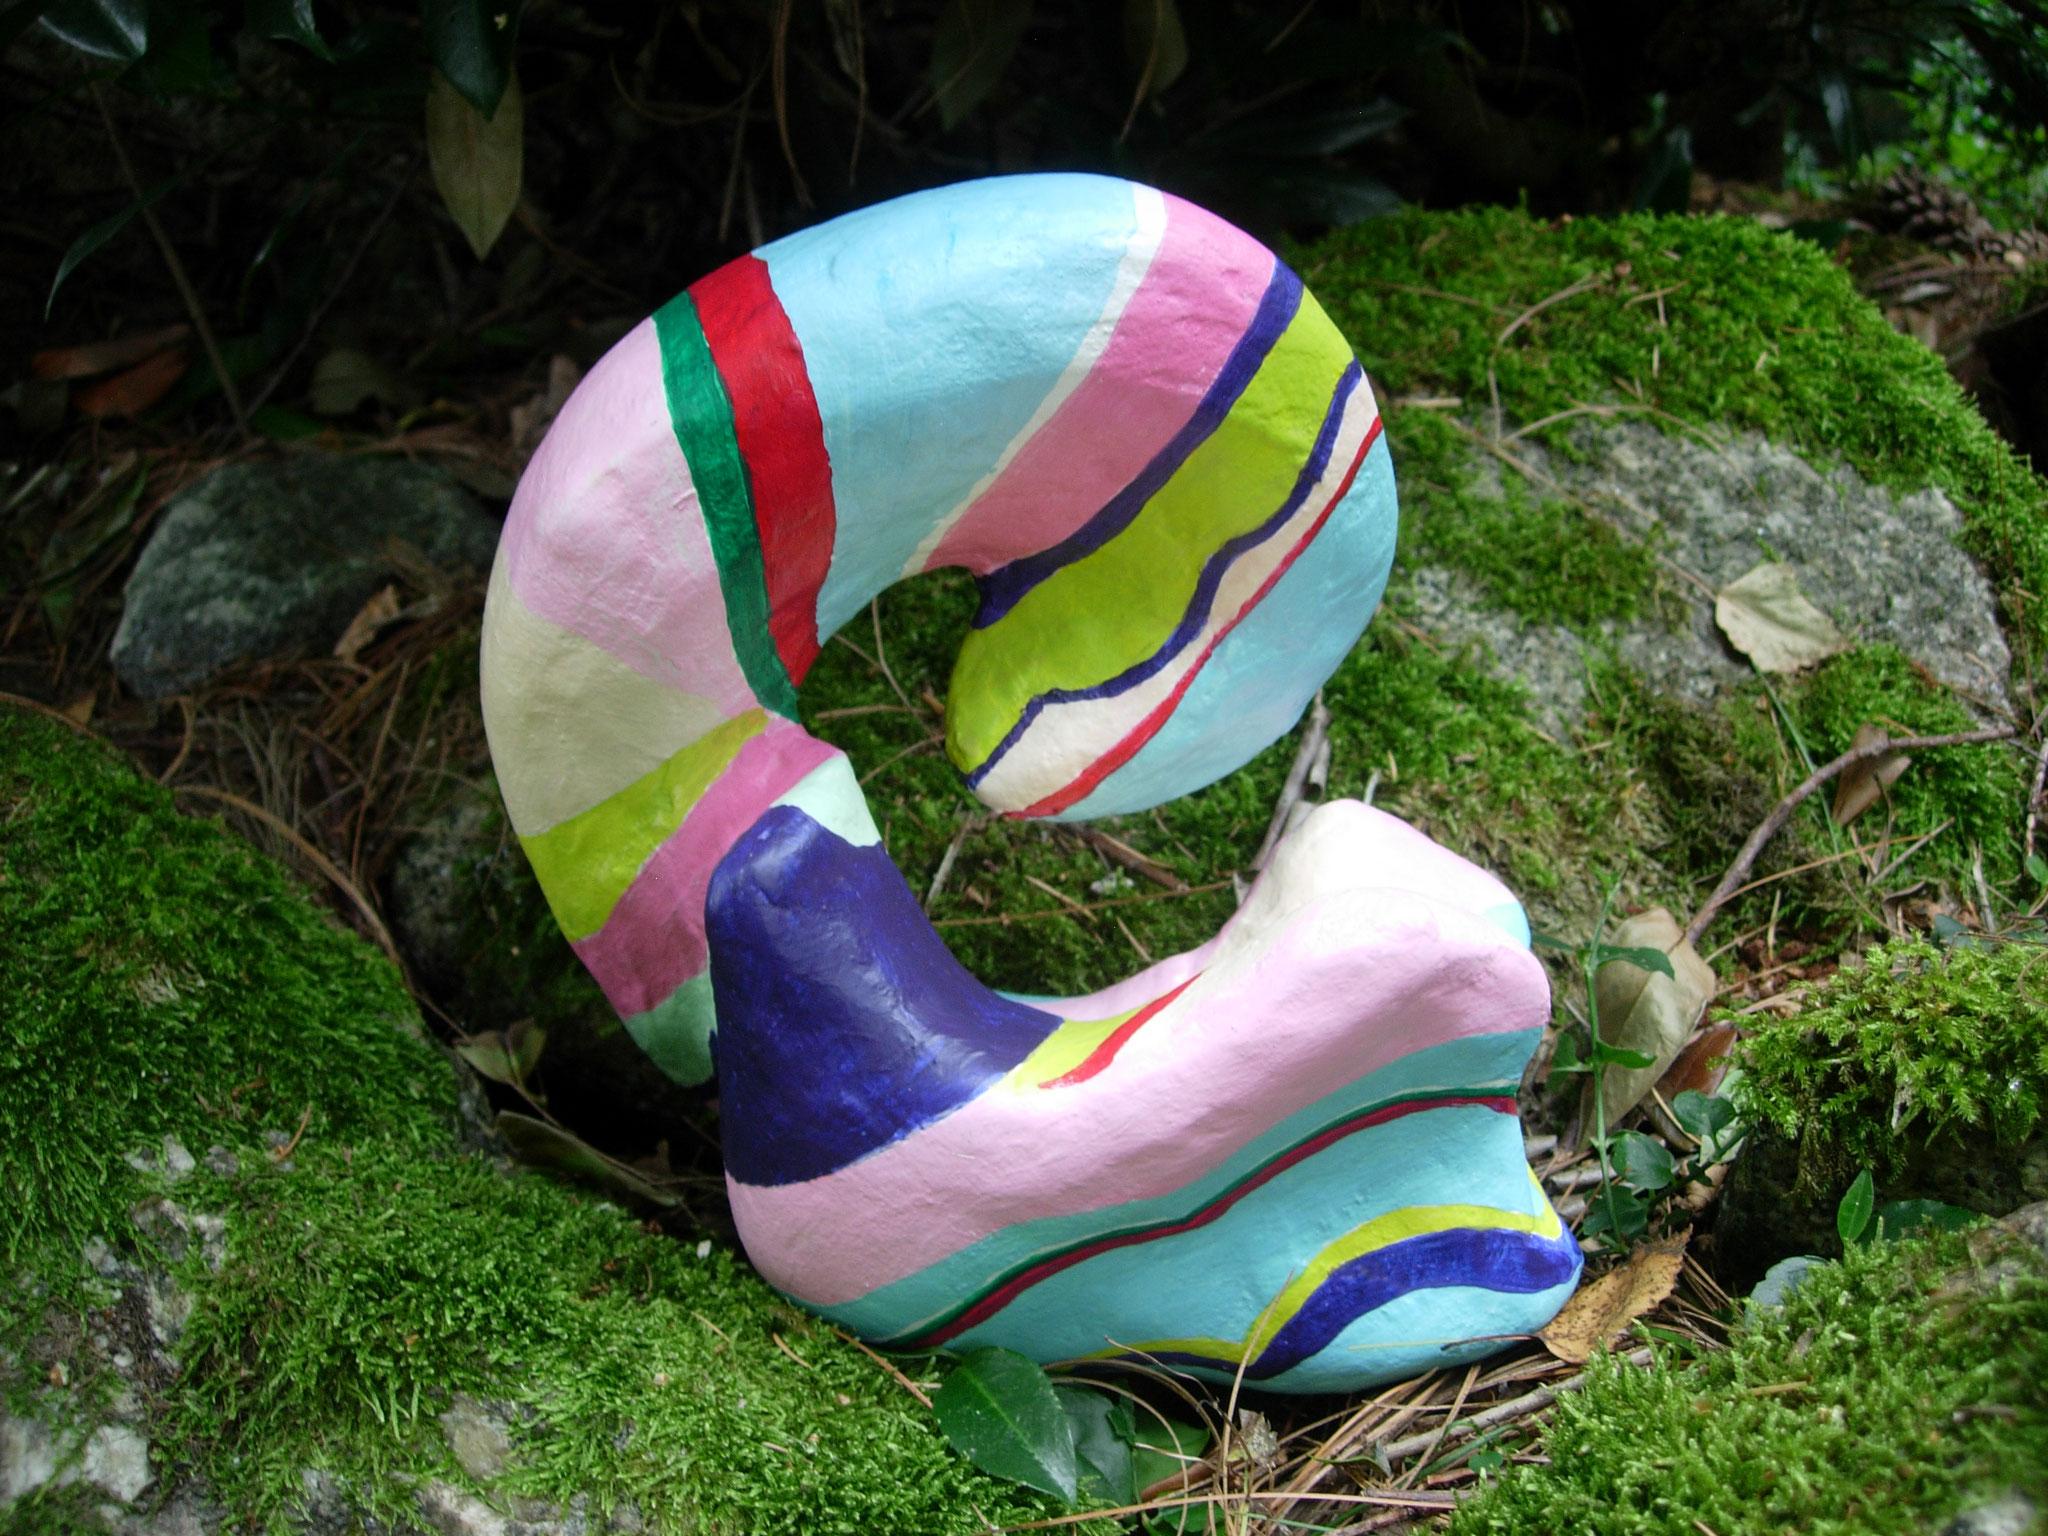 Skulptur o.T., Papiermaché, Acrylfarbe, 12x20x24 cm